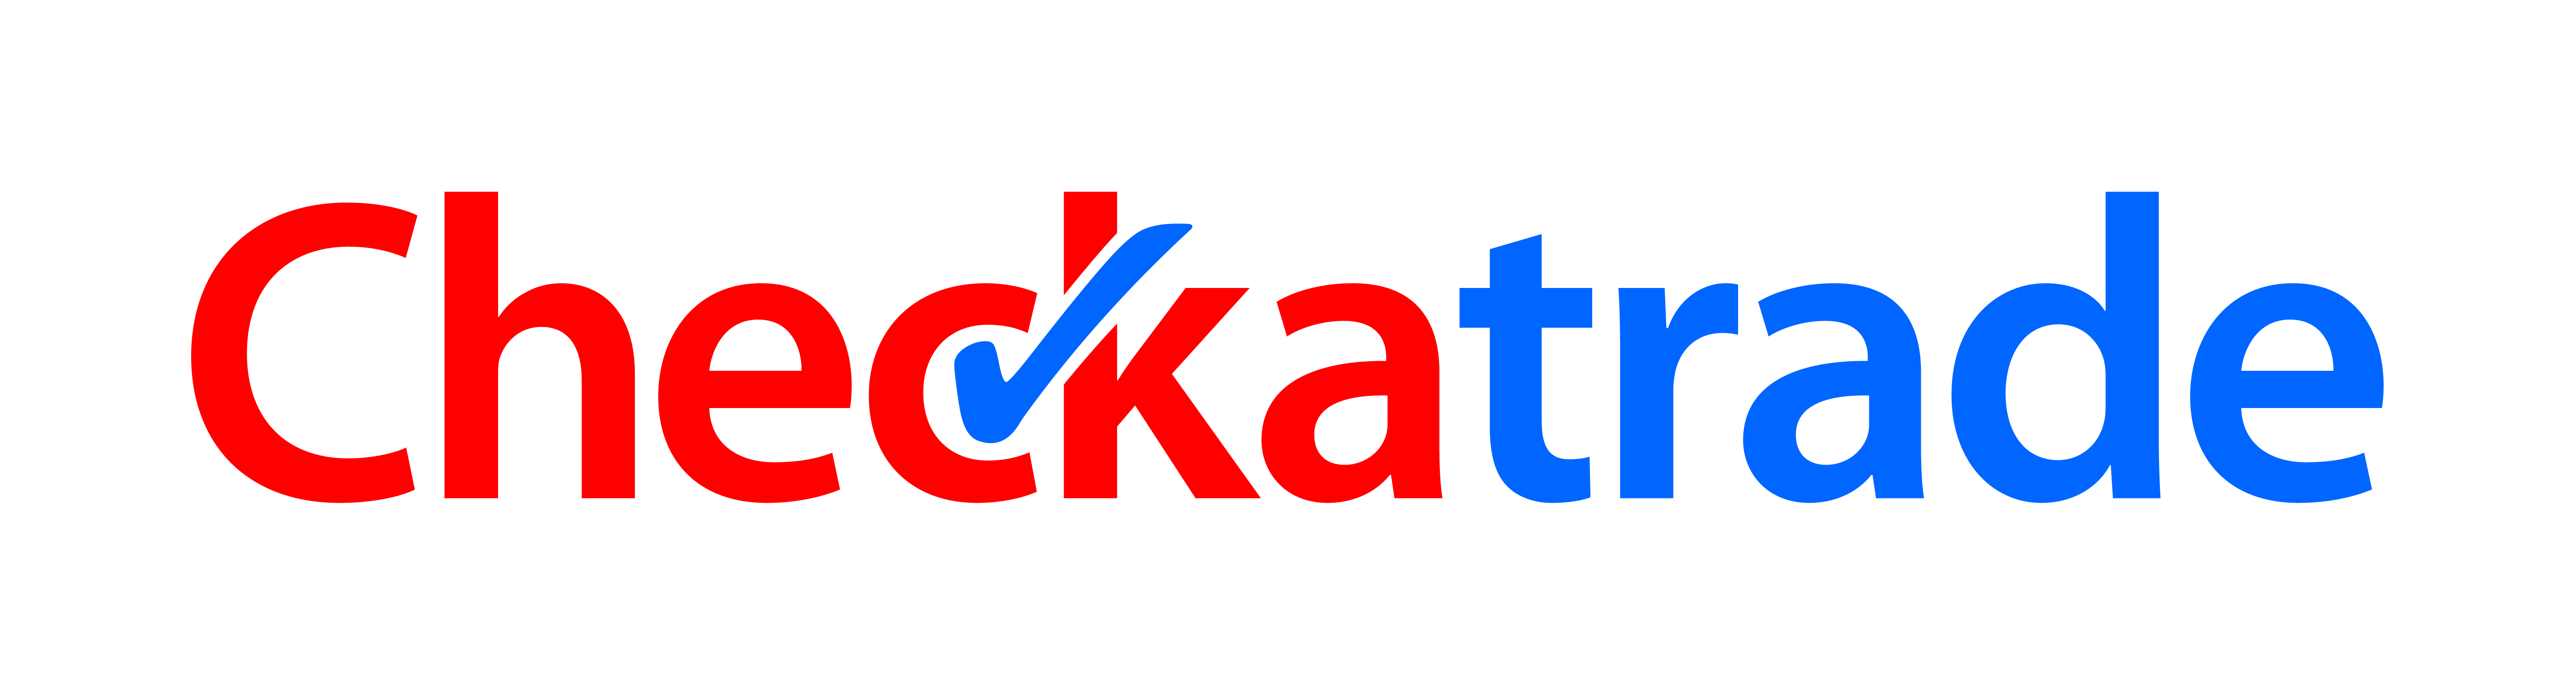 checkatrade-no-straplinepng